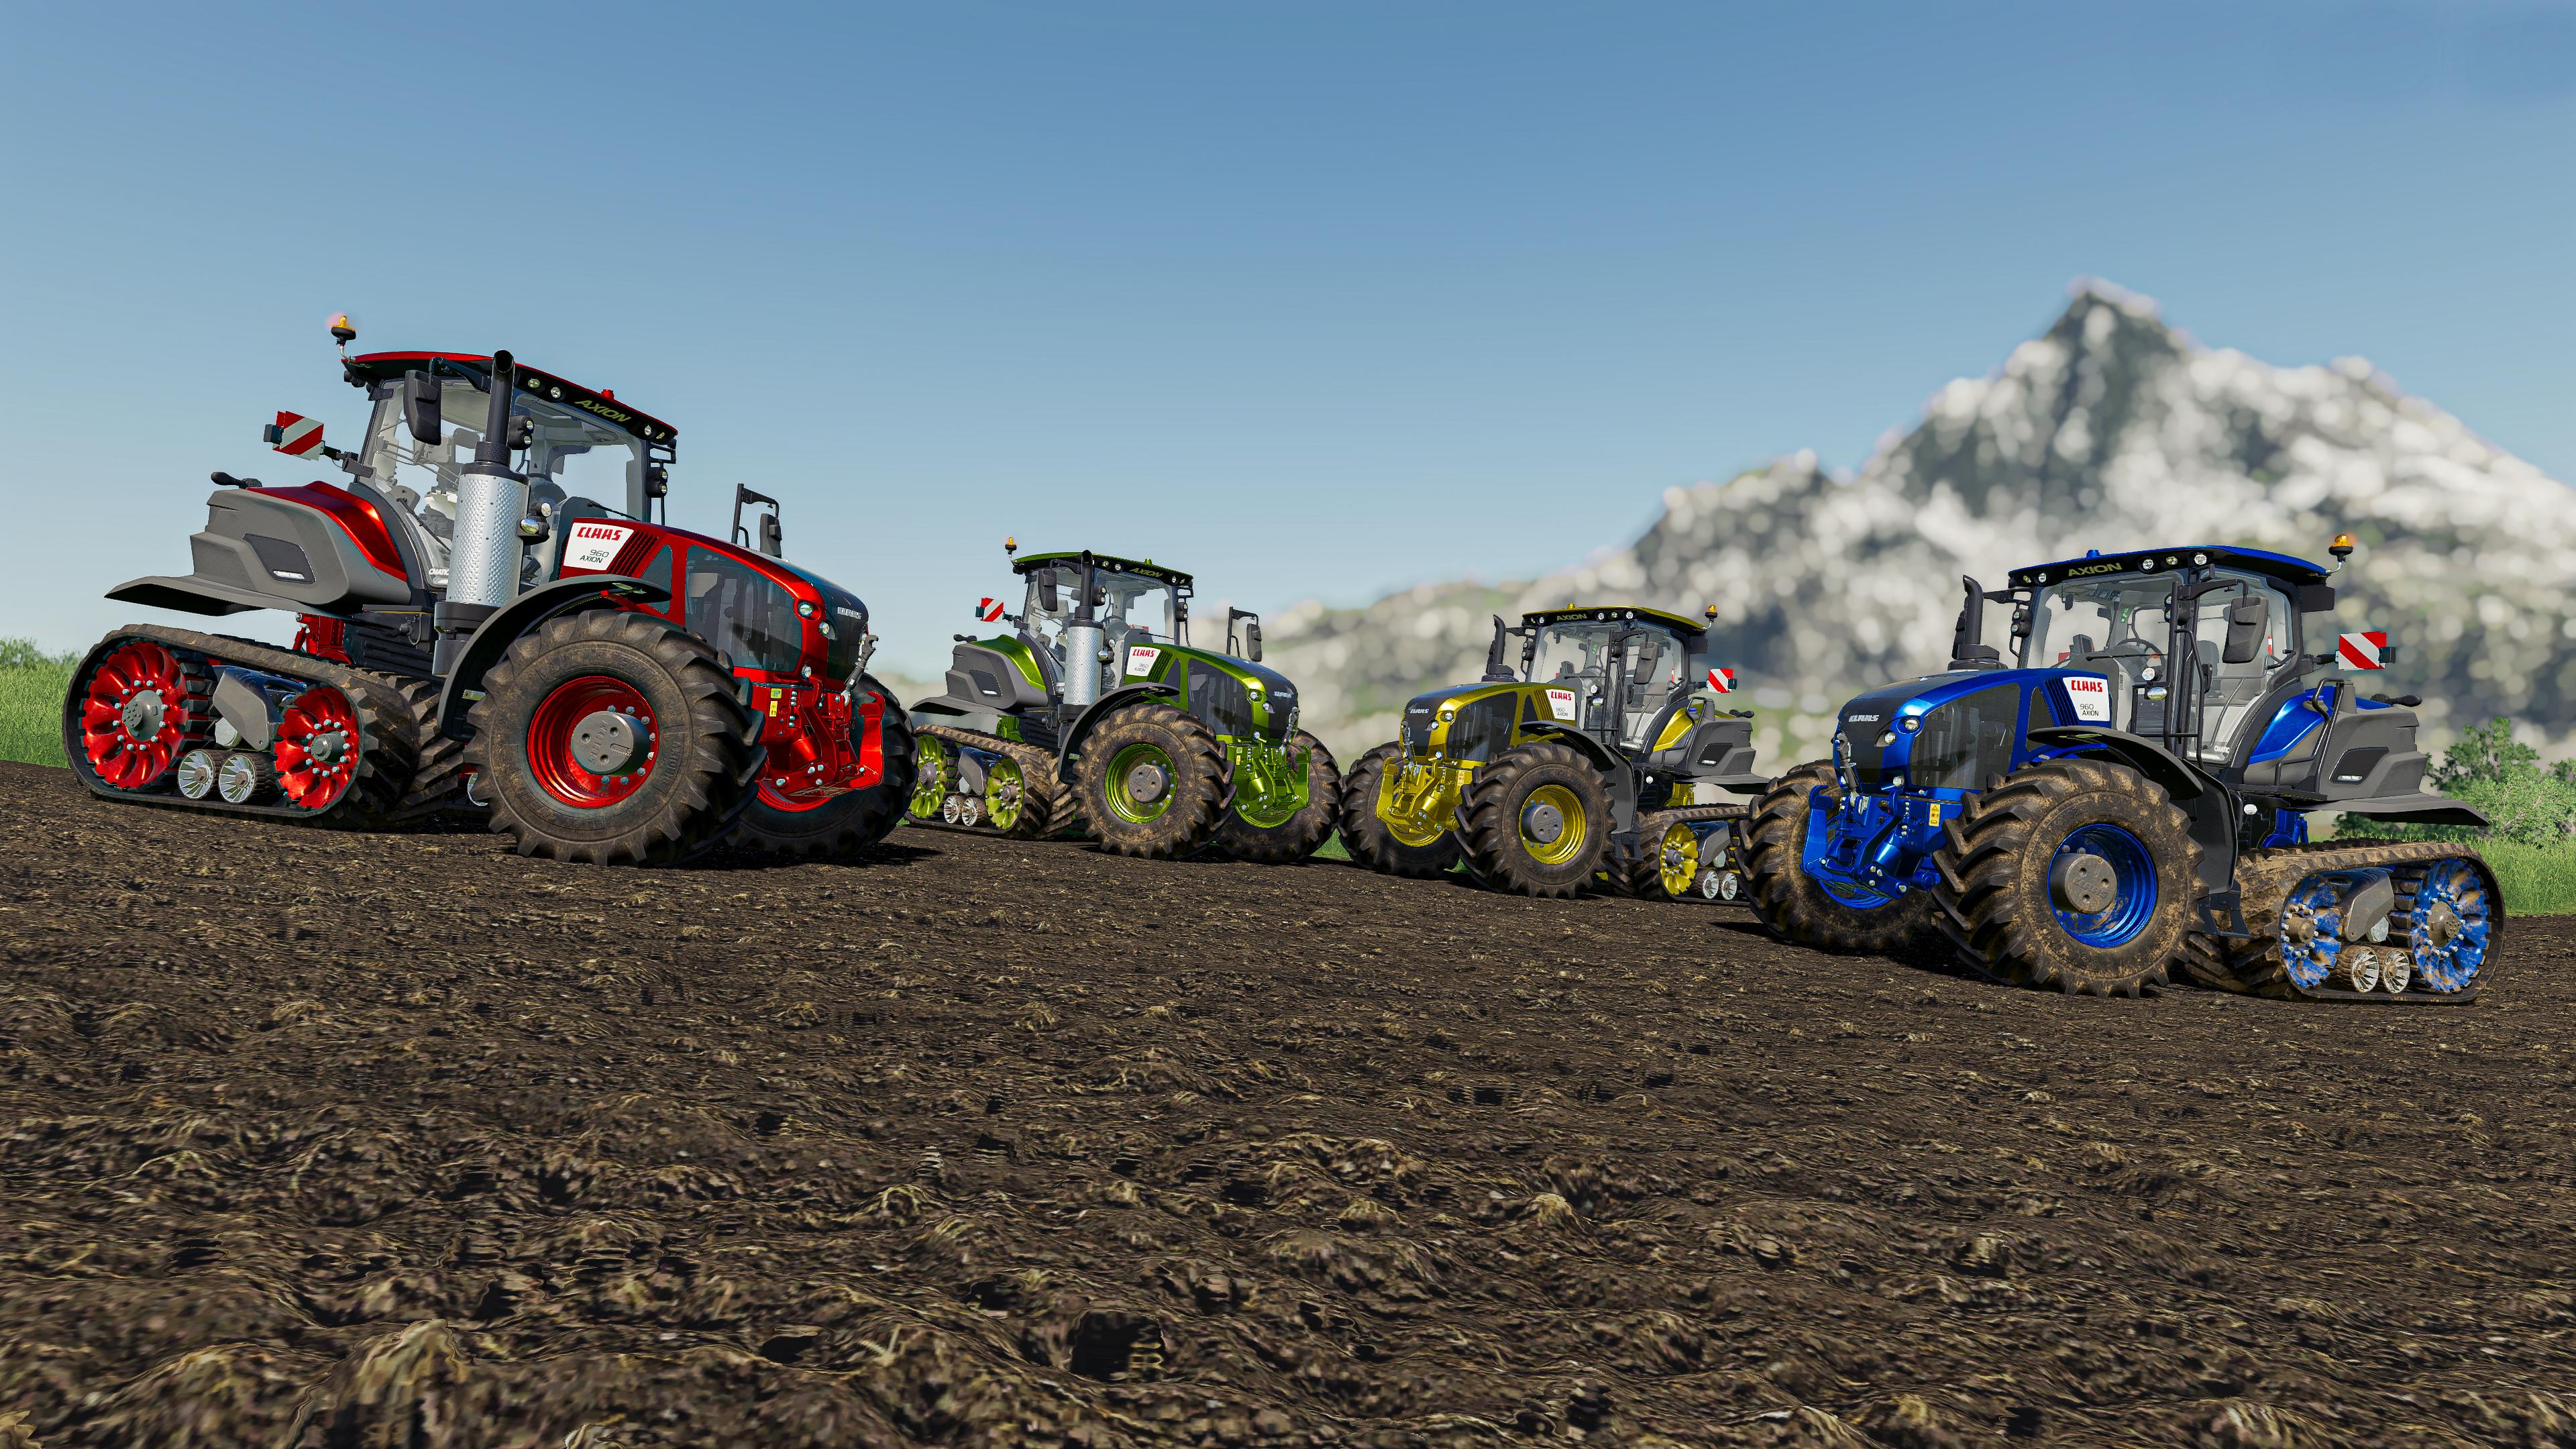 General 3840x2160 farm farming farming simulator tractors green red metal yellow blue RGB landscape fs19 farmers farming simulator 2019